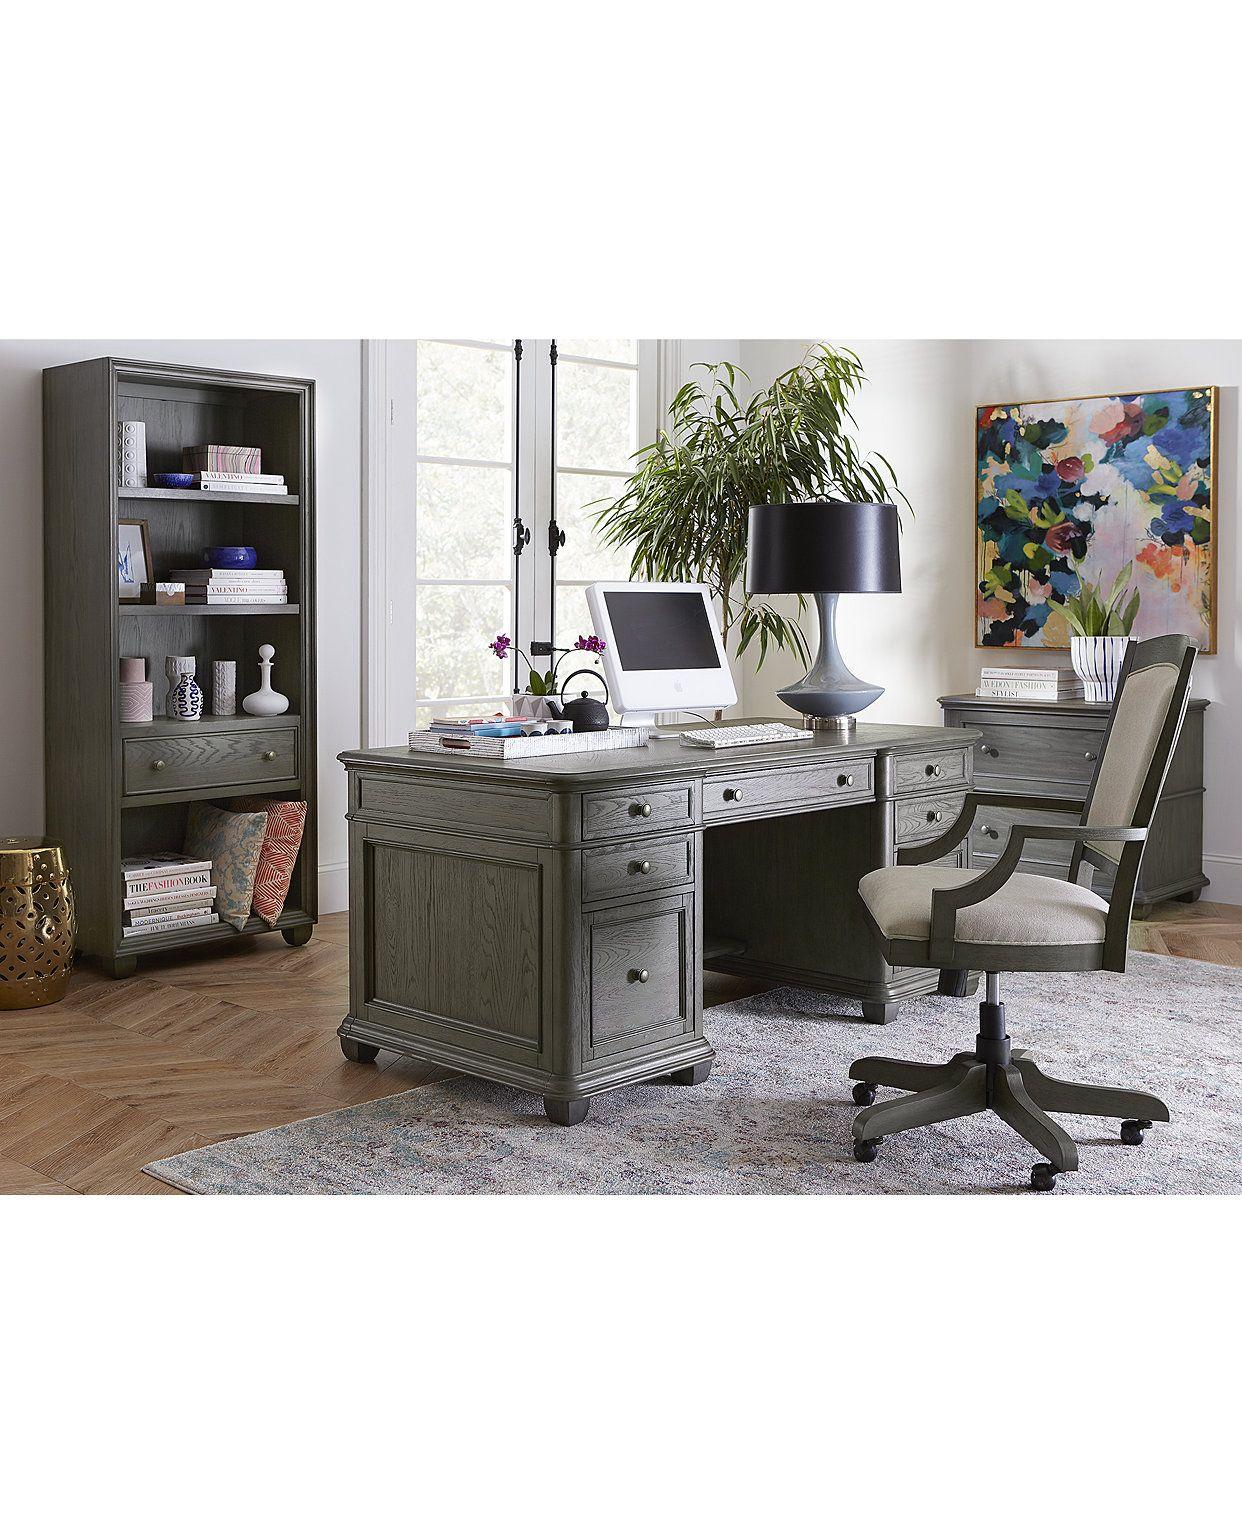 Furniture Sloane Home Office, 4-Pc. Set (Executive Desk